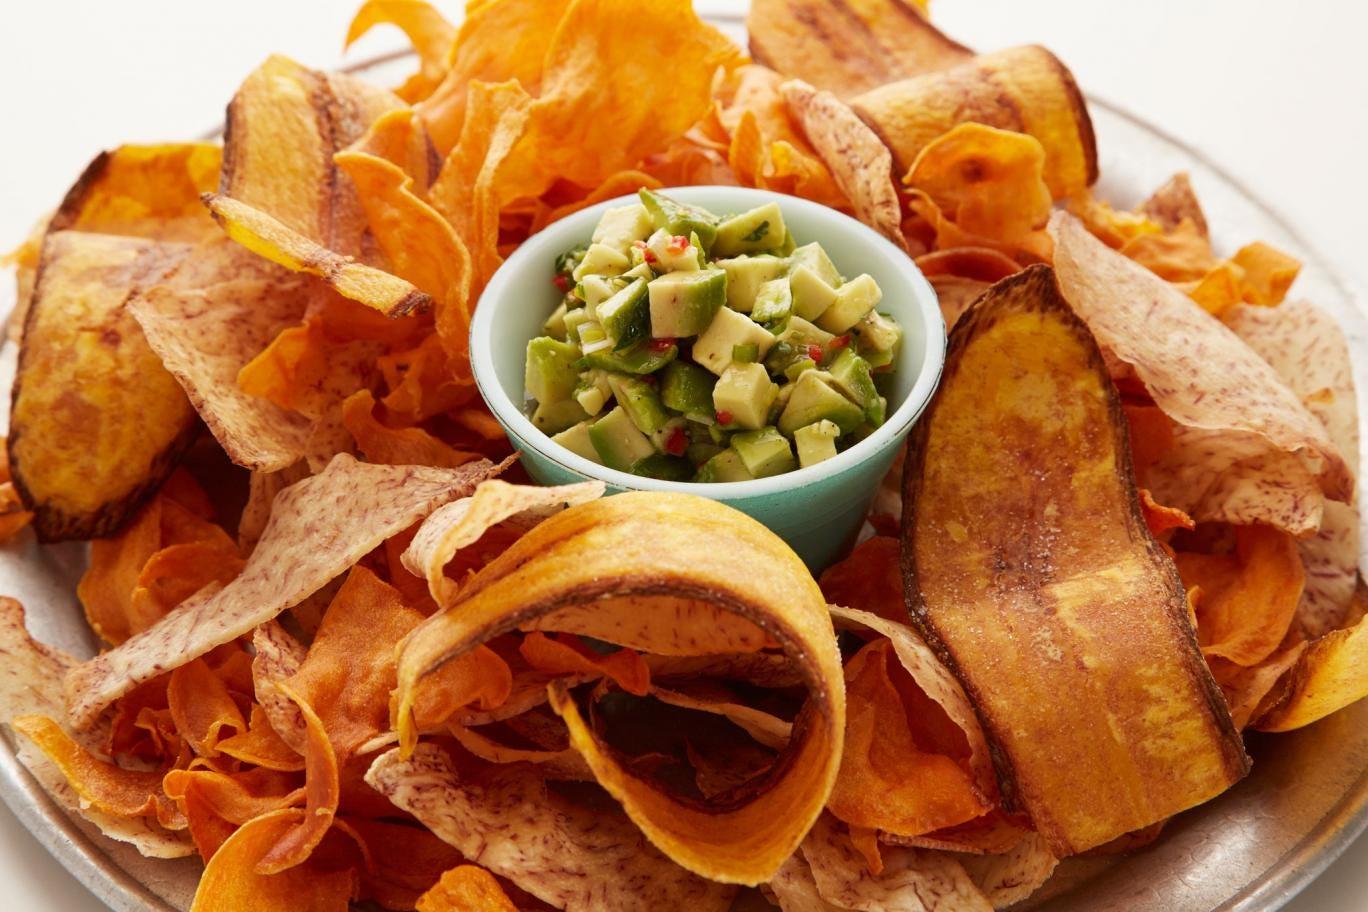 Caribbean crisps with avocado salsa